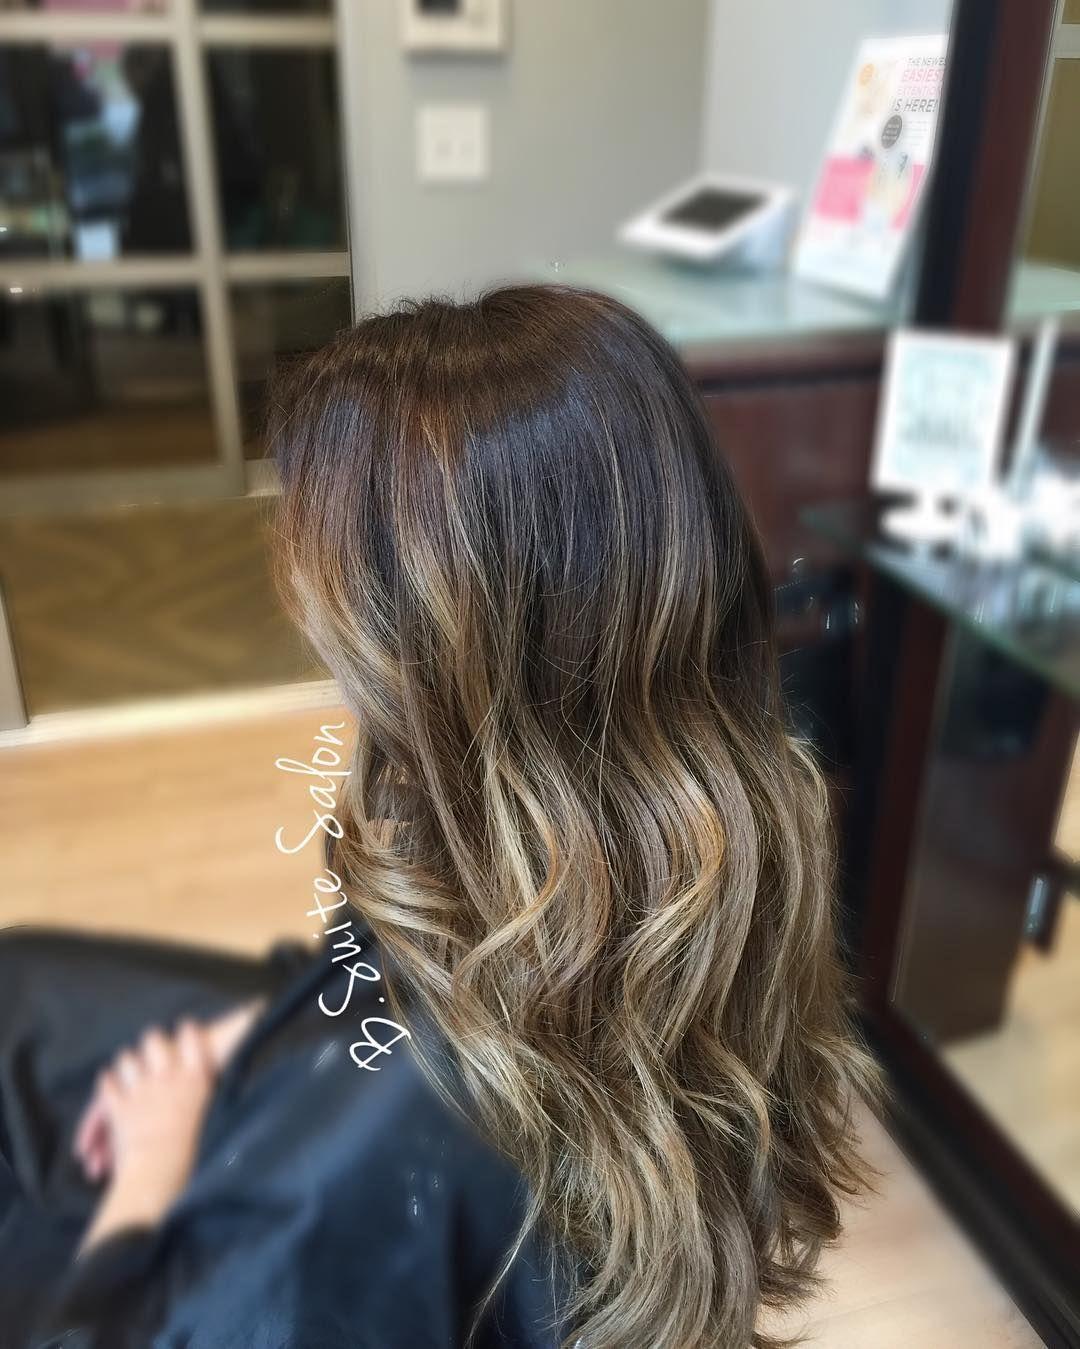 #atlhairstylist #atlsalon #atlhair #gahairstylist #buckheadstylist #buckheadsalon #buckheadhair #blondebalayage #hair #modernsalon #behindthechair #btcpics #hairbrained #beautylaunchpad #americansalon #stylistshopconnect #nothingbutpixies #guytang #sunkissed #balayage #hairpainting #hairgoals #balayageombre #fallhair #imallaboutdahair #mastersofbalayage #thatsdarling #licensedtocreate #hairtalk #balayagespecialist